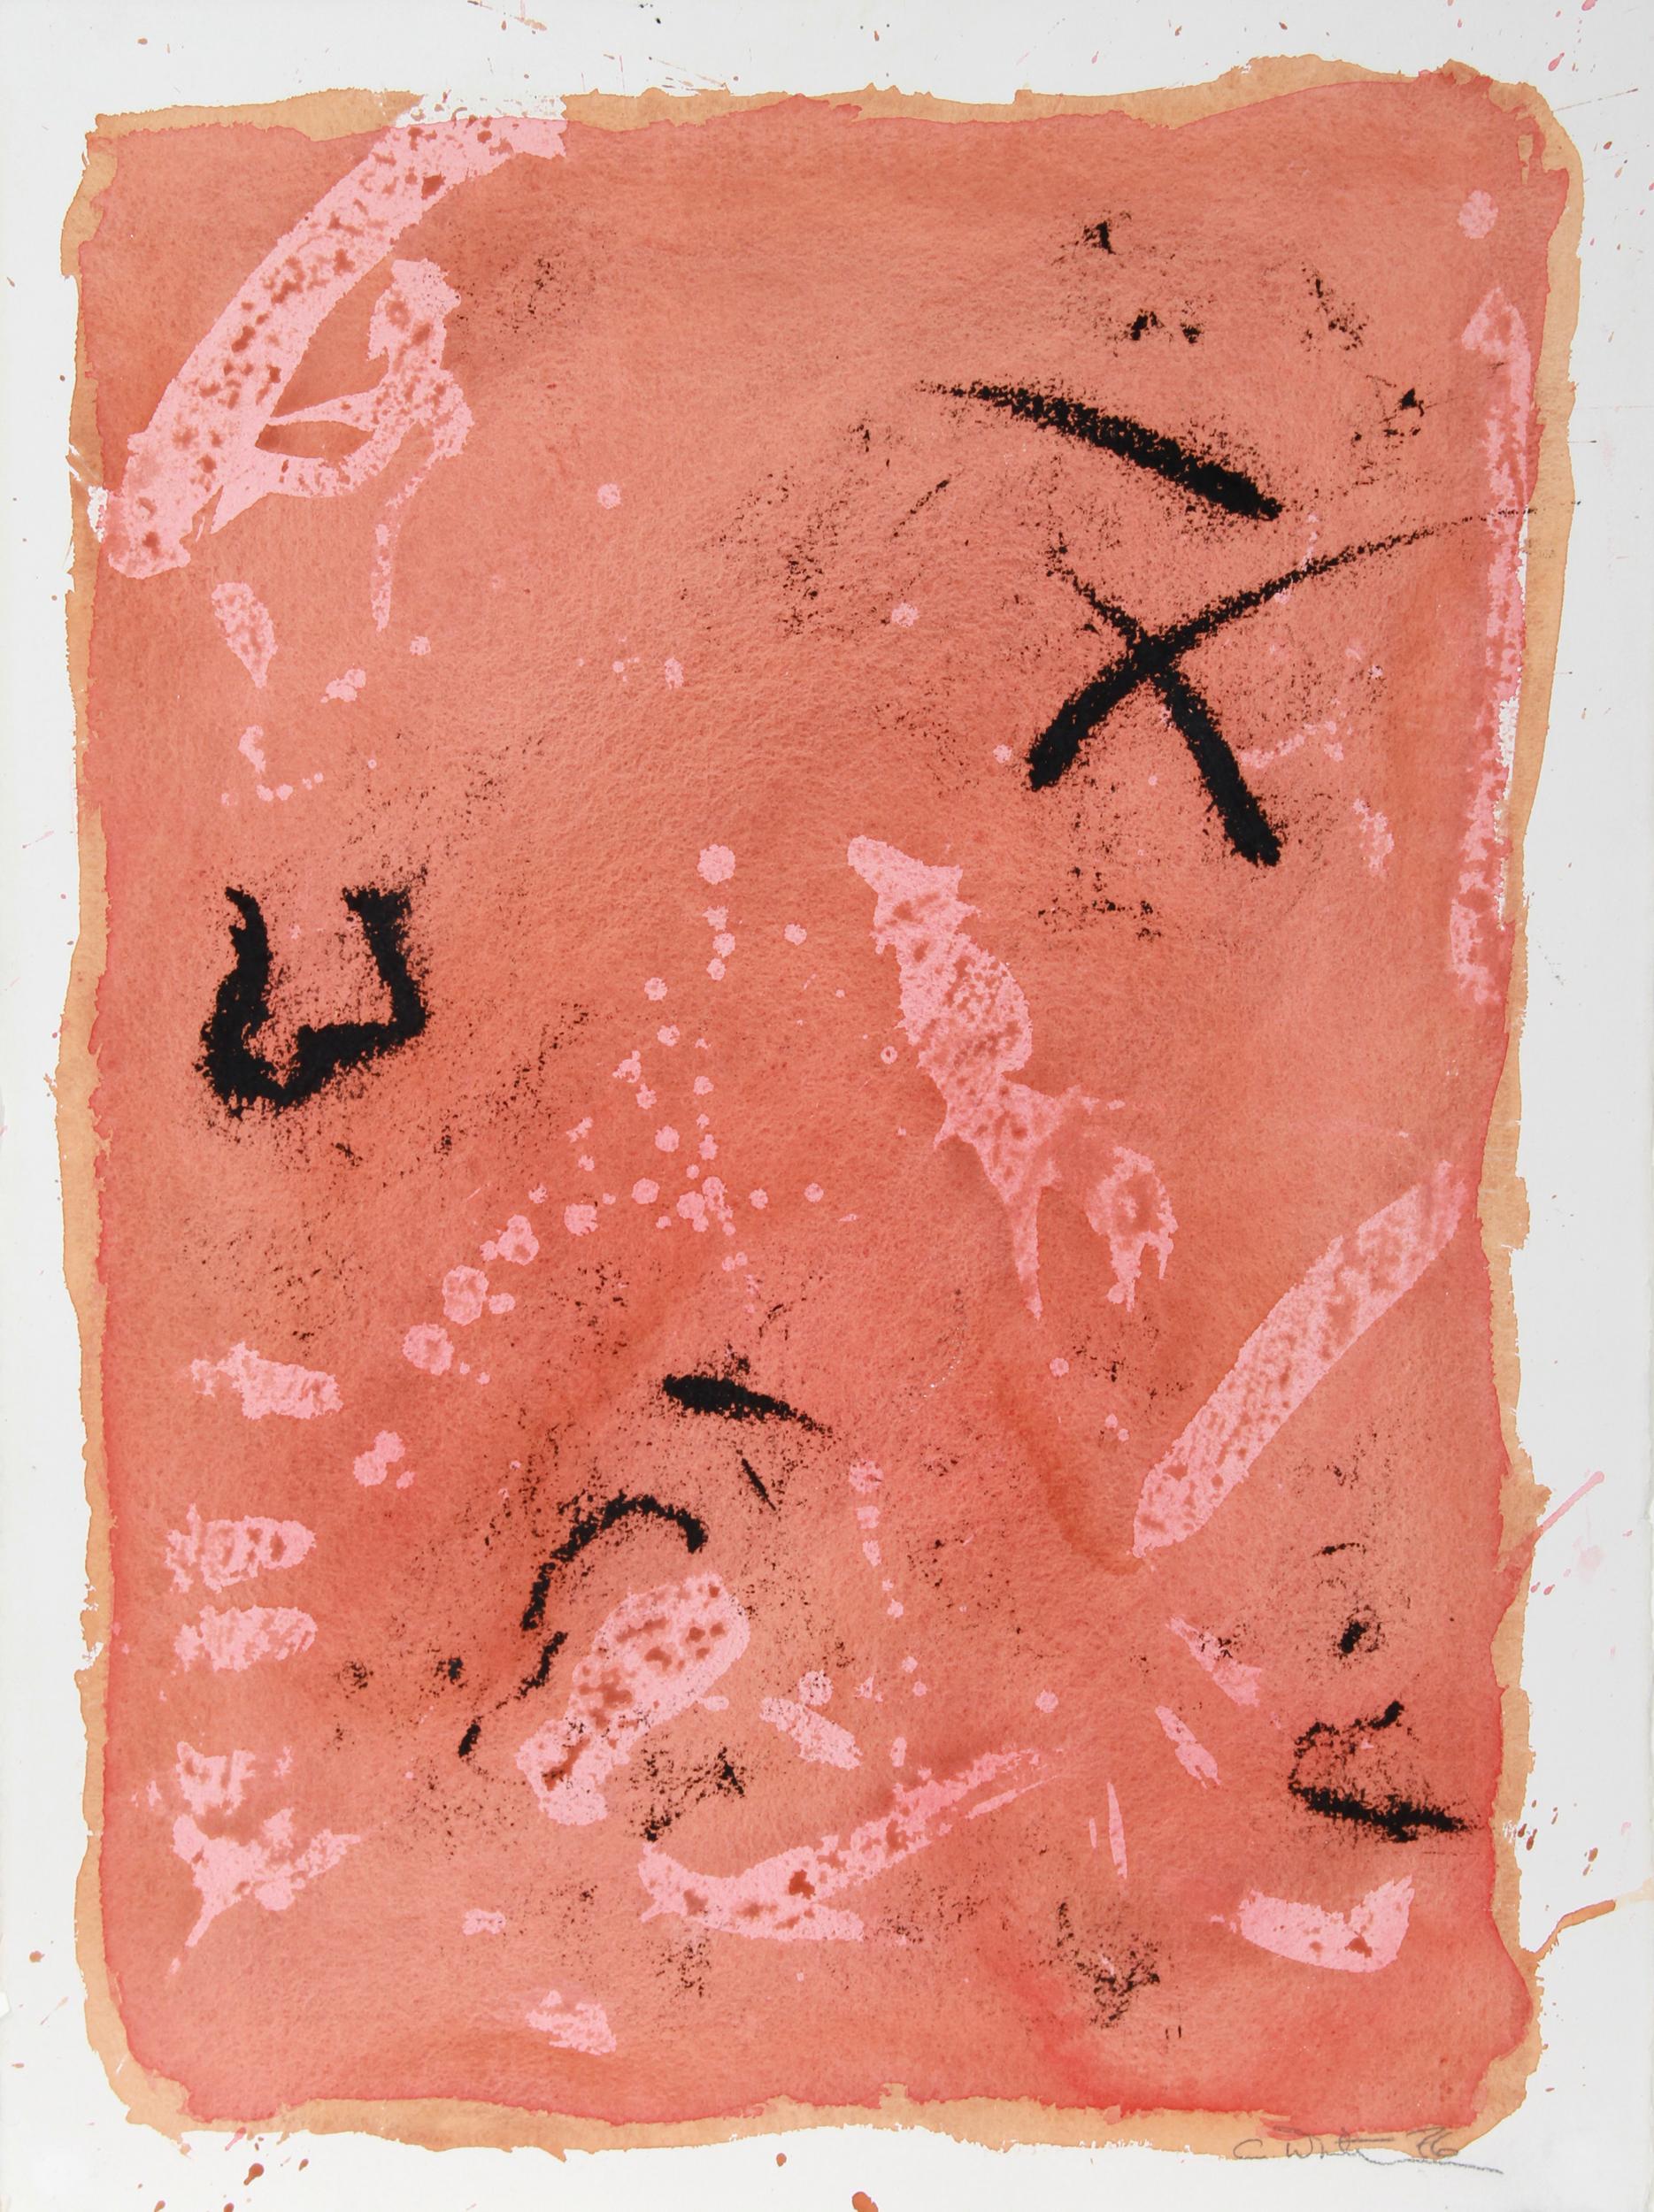 Kit (aka Christopher) White, Sweet Cyprus, Acrylic Painting